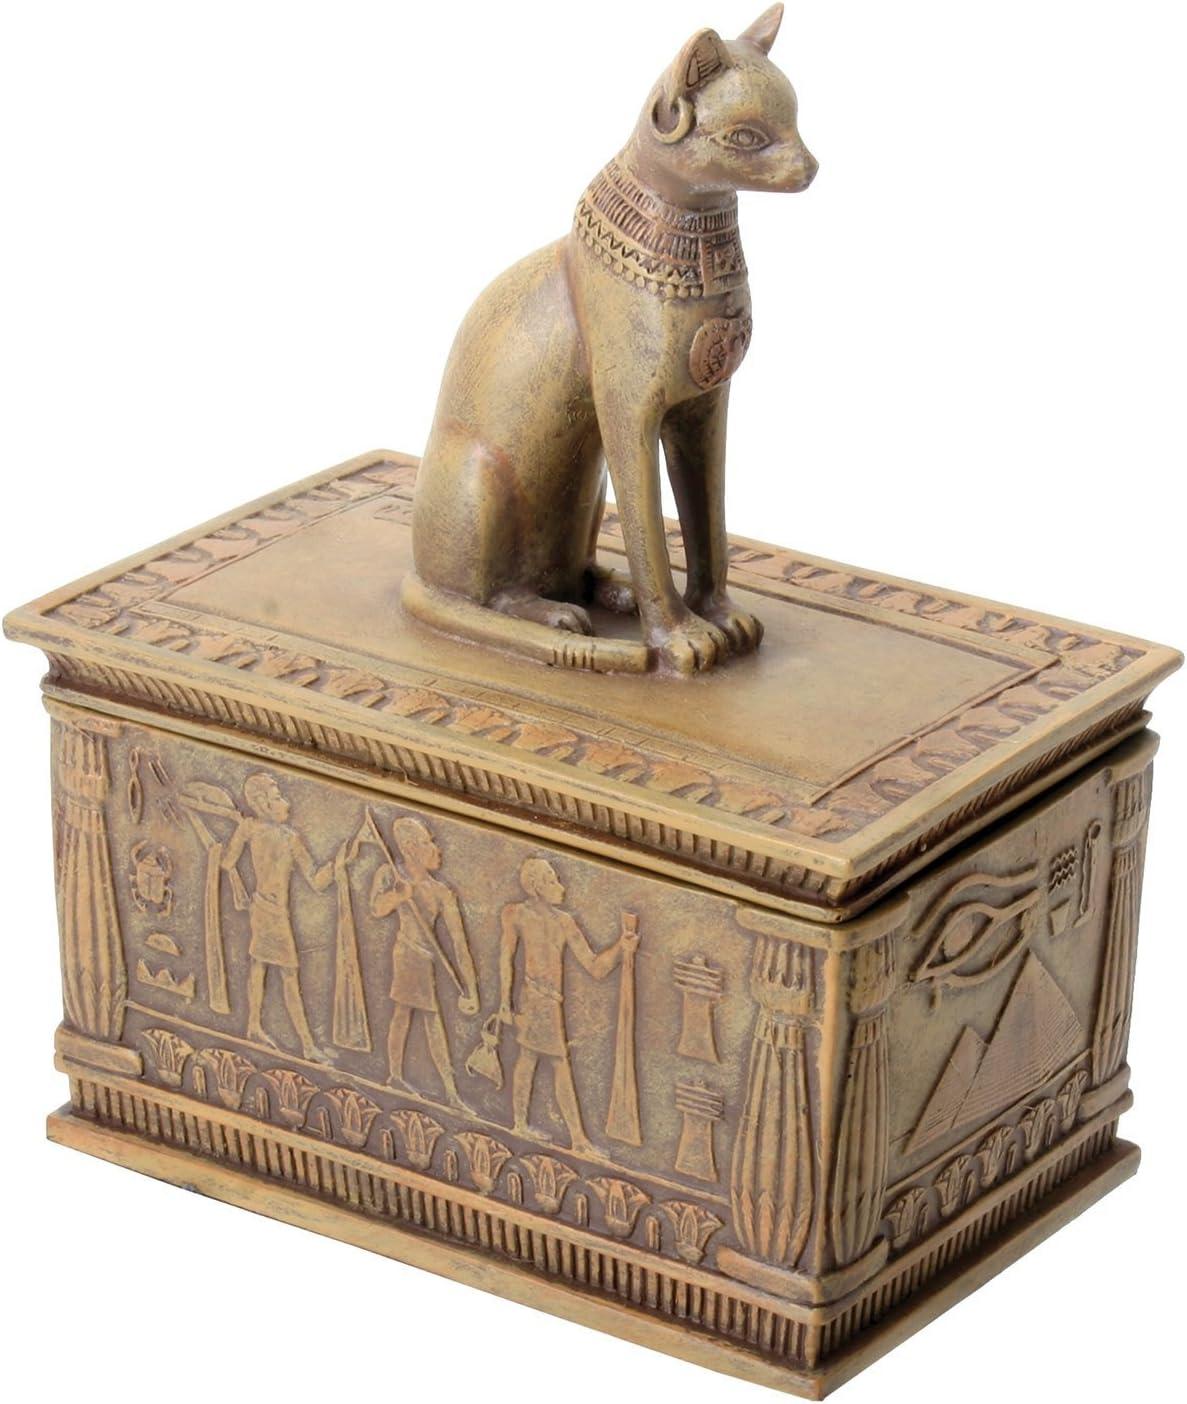 Summit Sandstone Colored Bastet Box with Egyptian Detailed Bottom Design